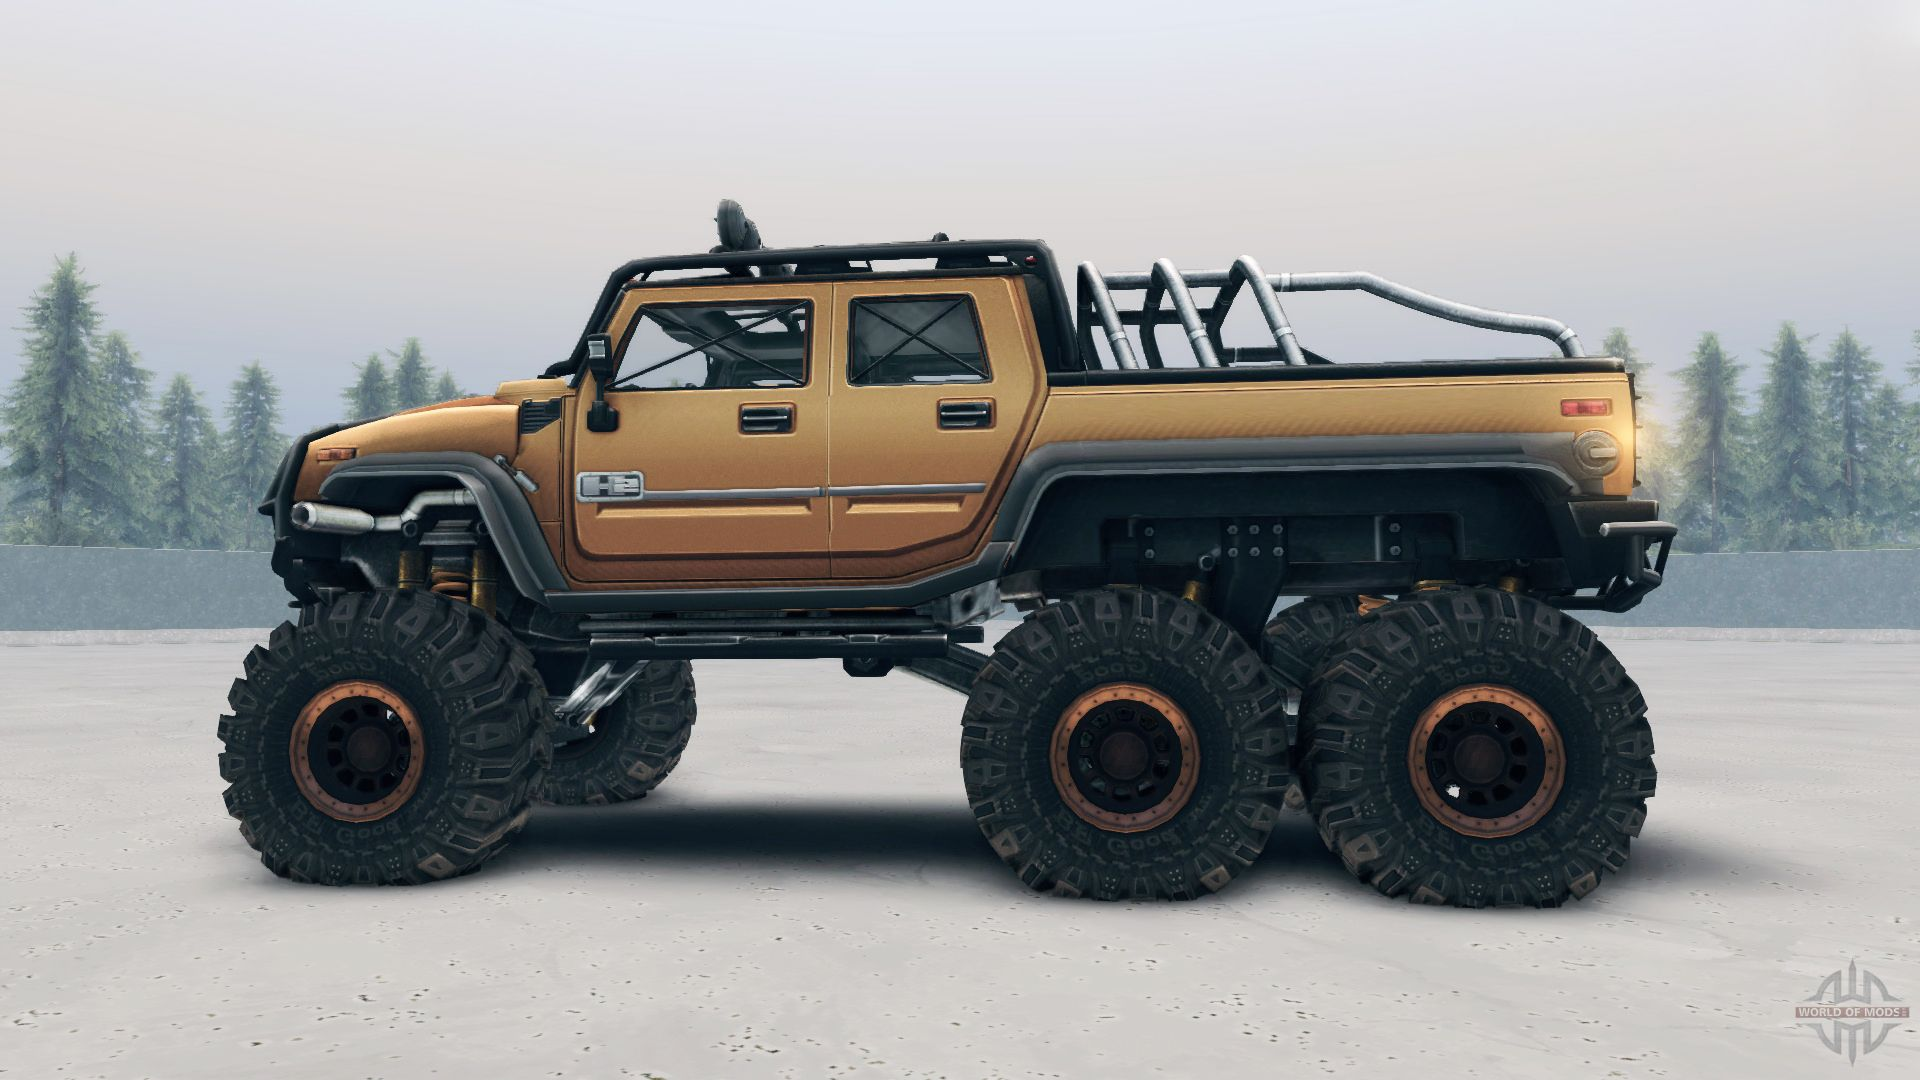 Hummer H2 Sut 6x6 para el videojuego Spin Tires